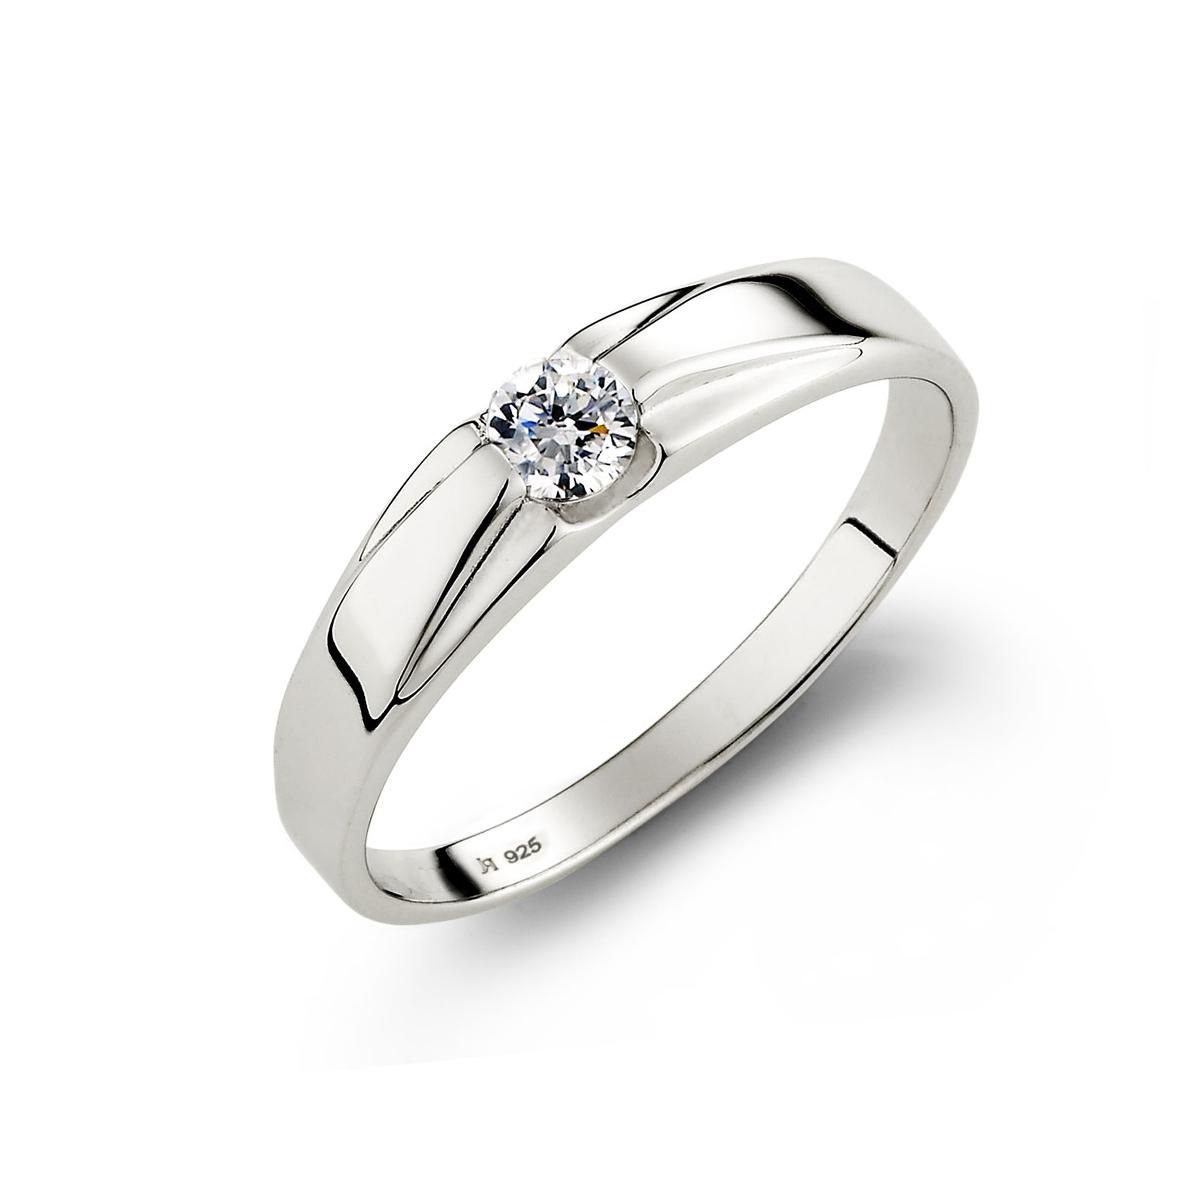 KSM59 永恆之星單鑽戒指